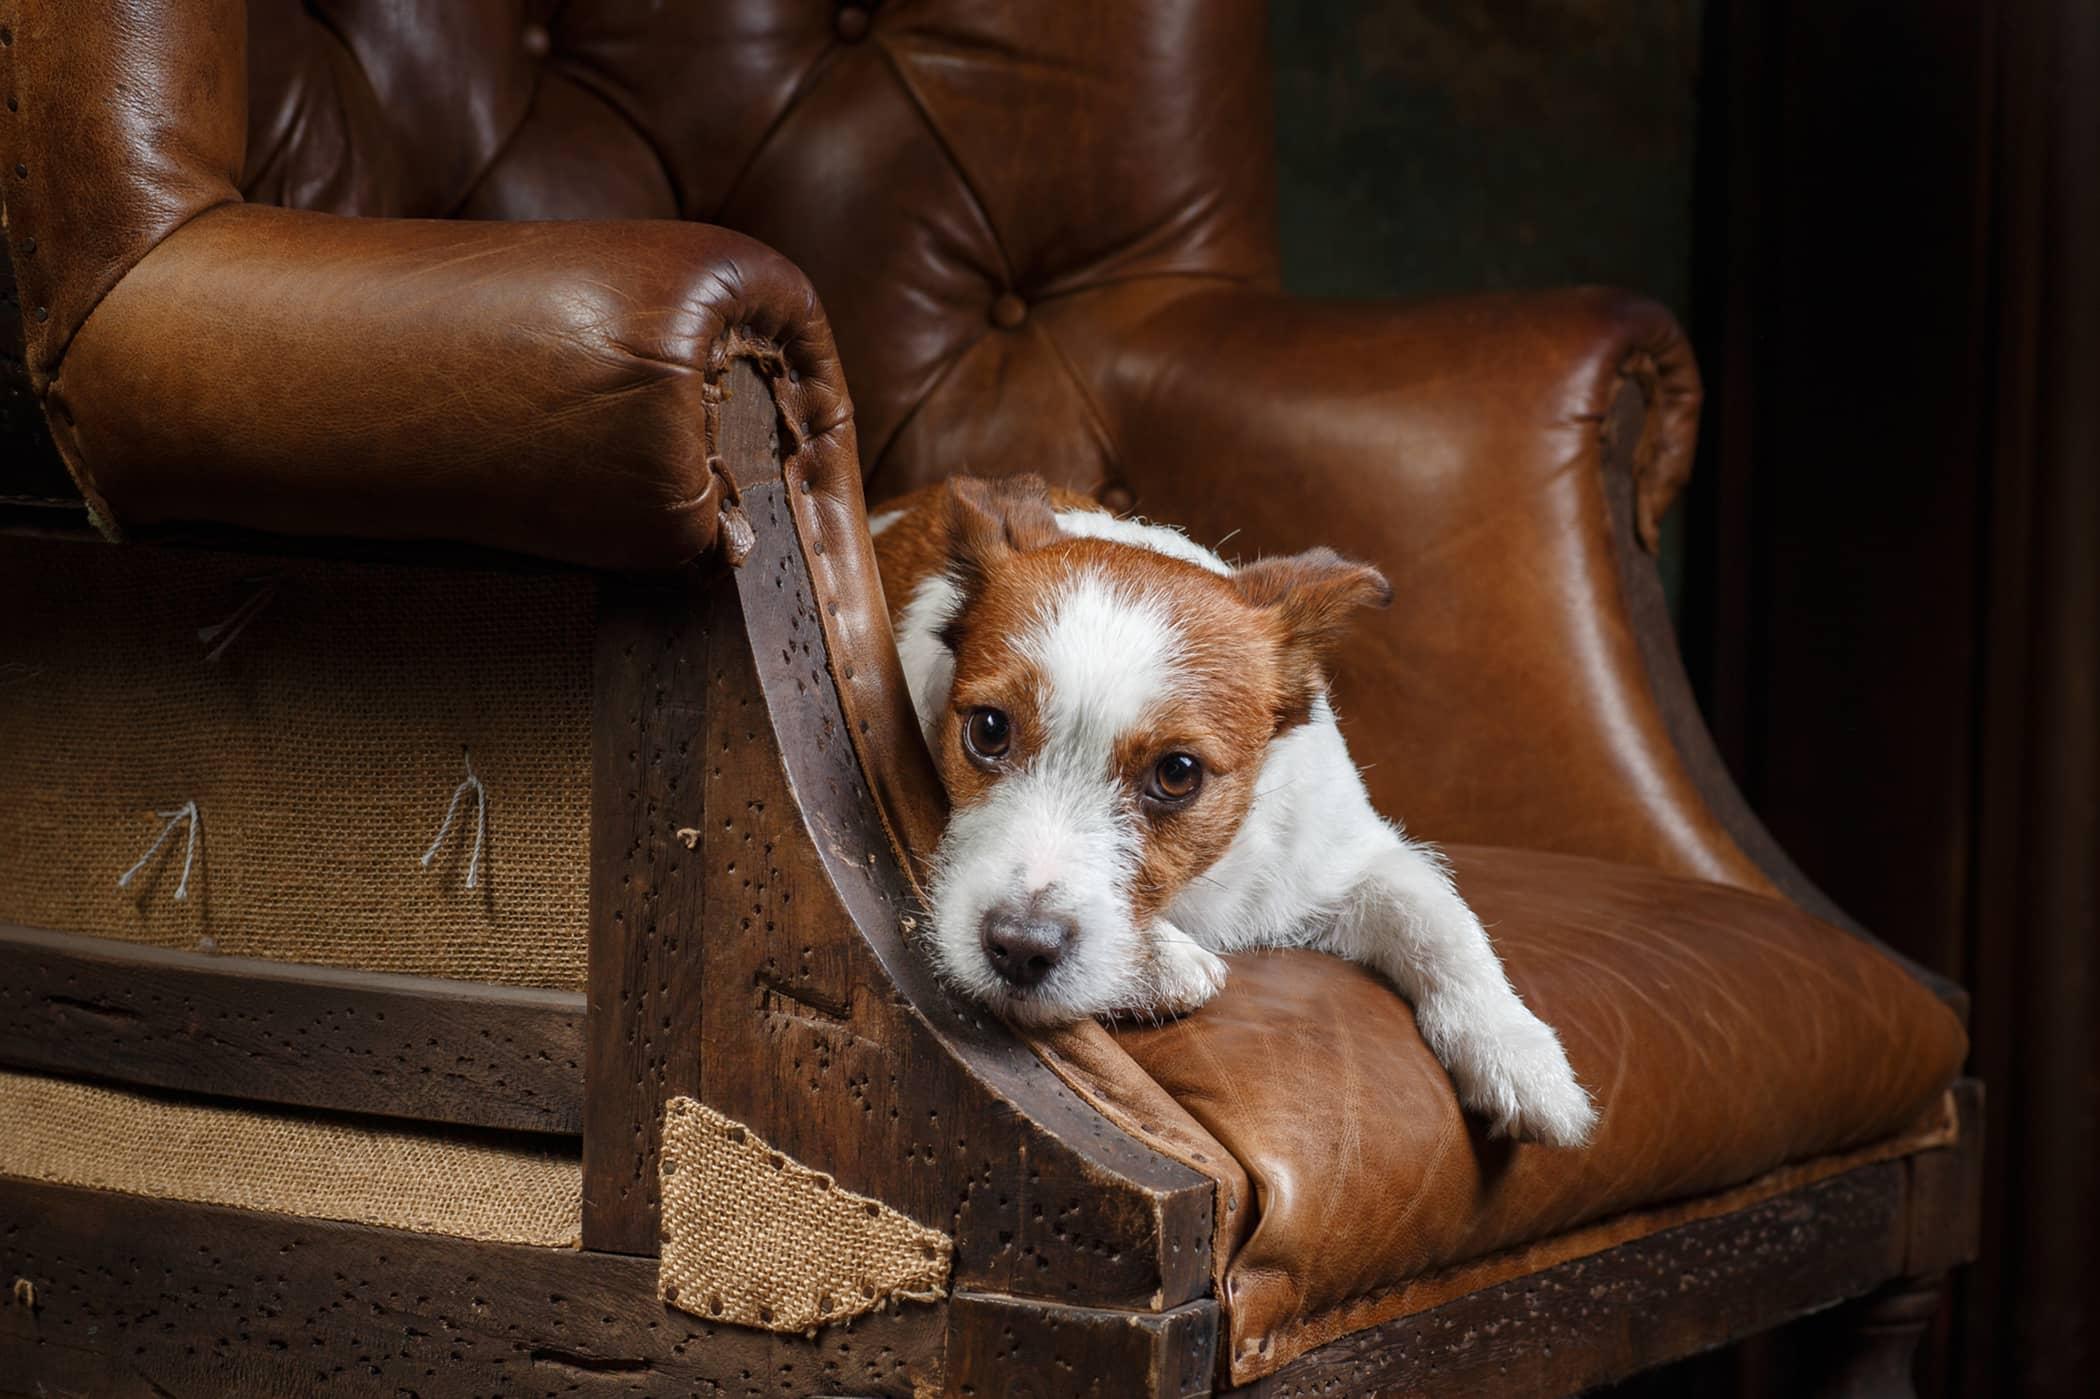 Esophageal Balloon Dilation in Dogs